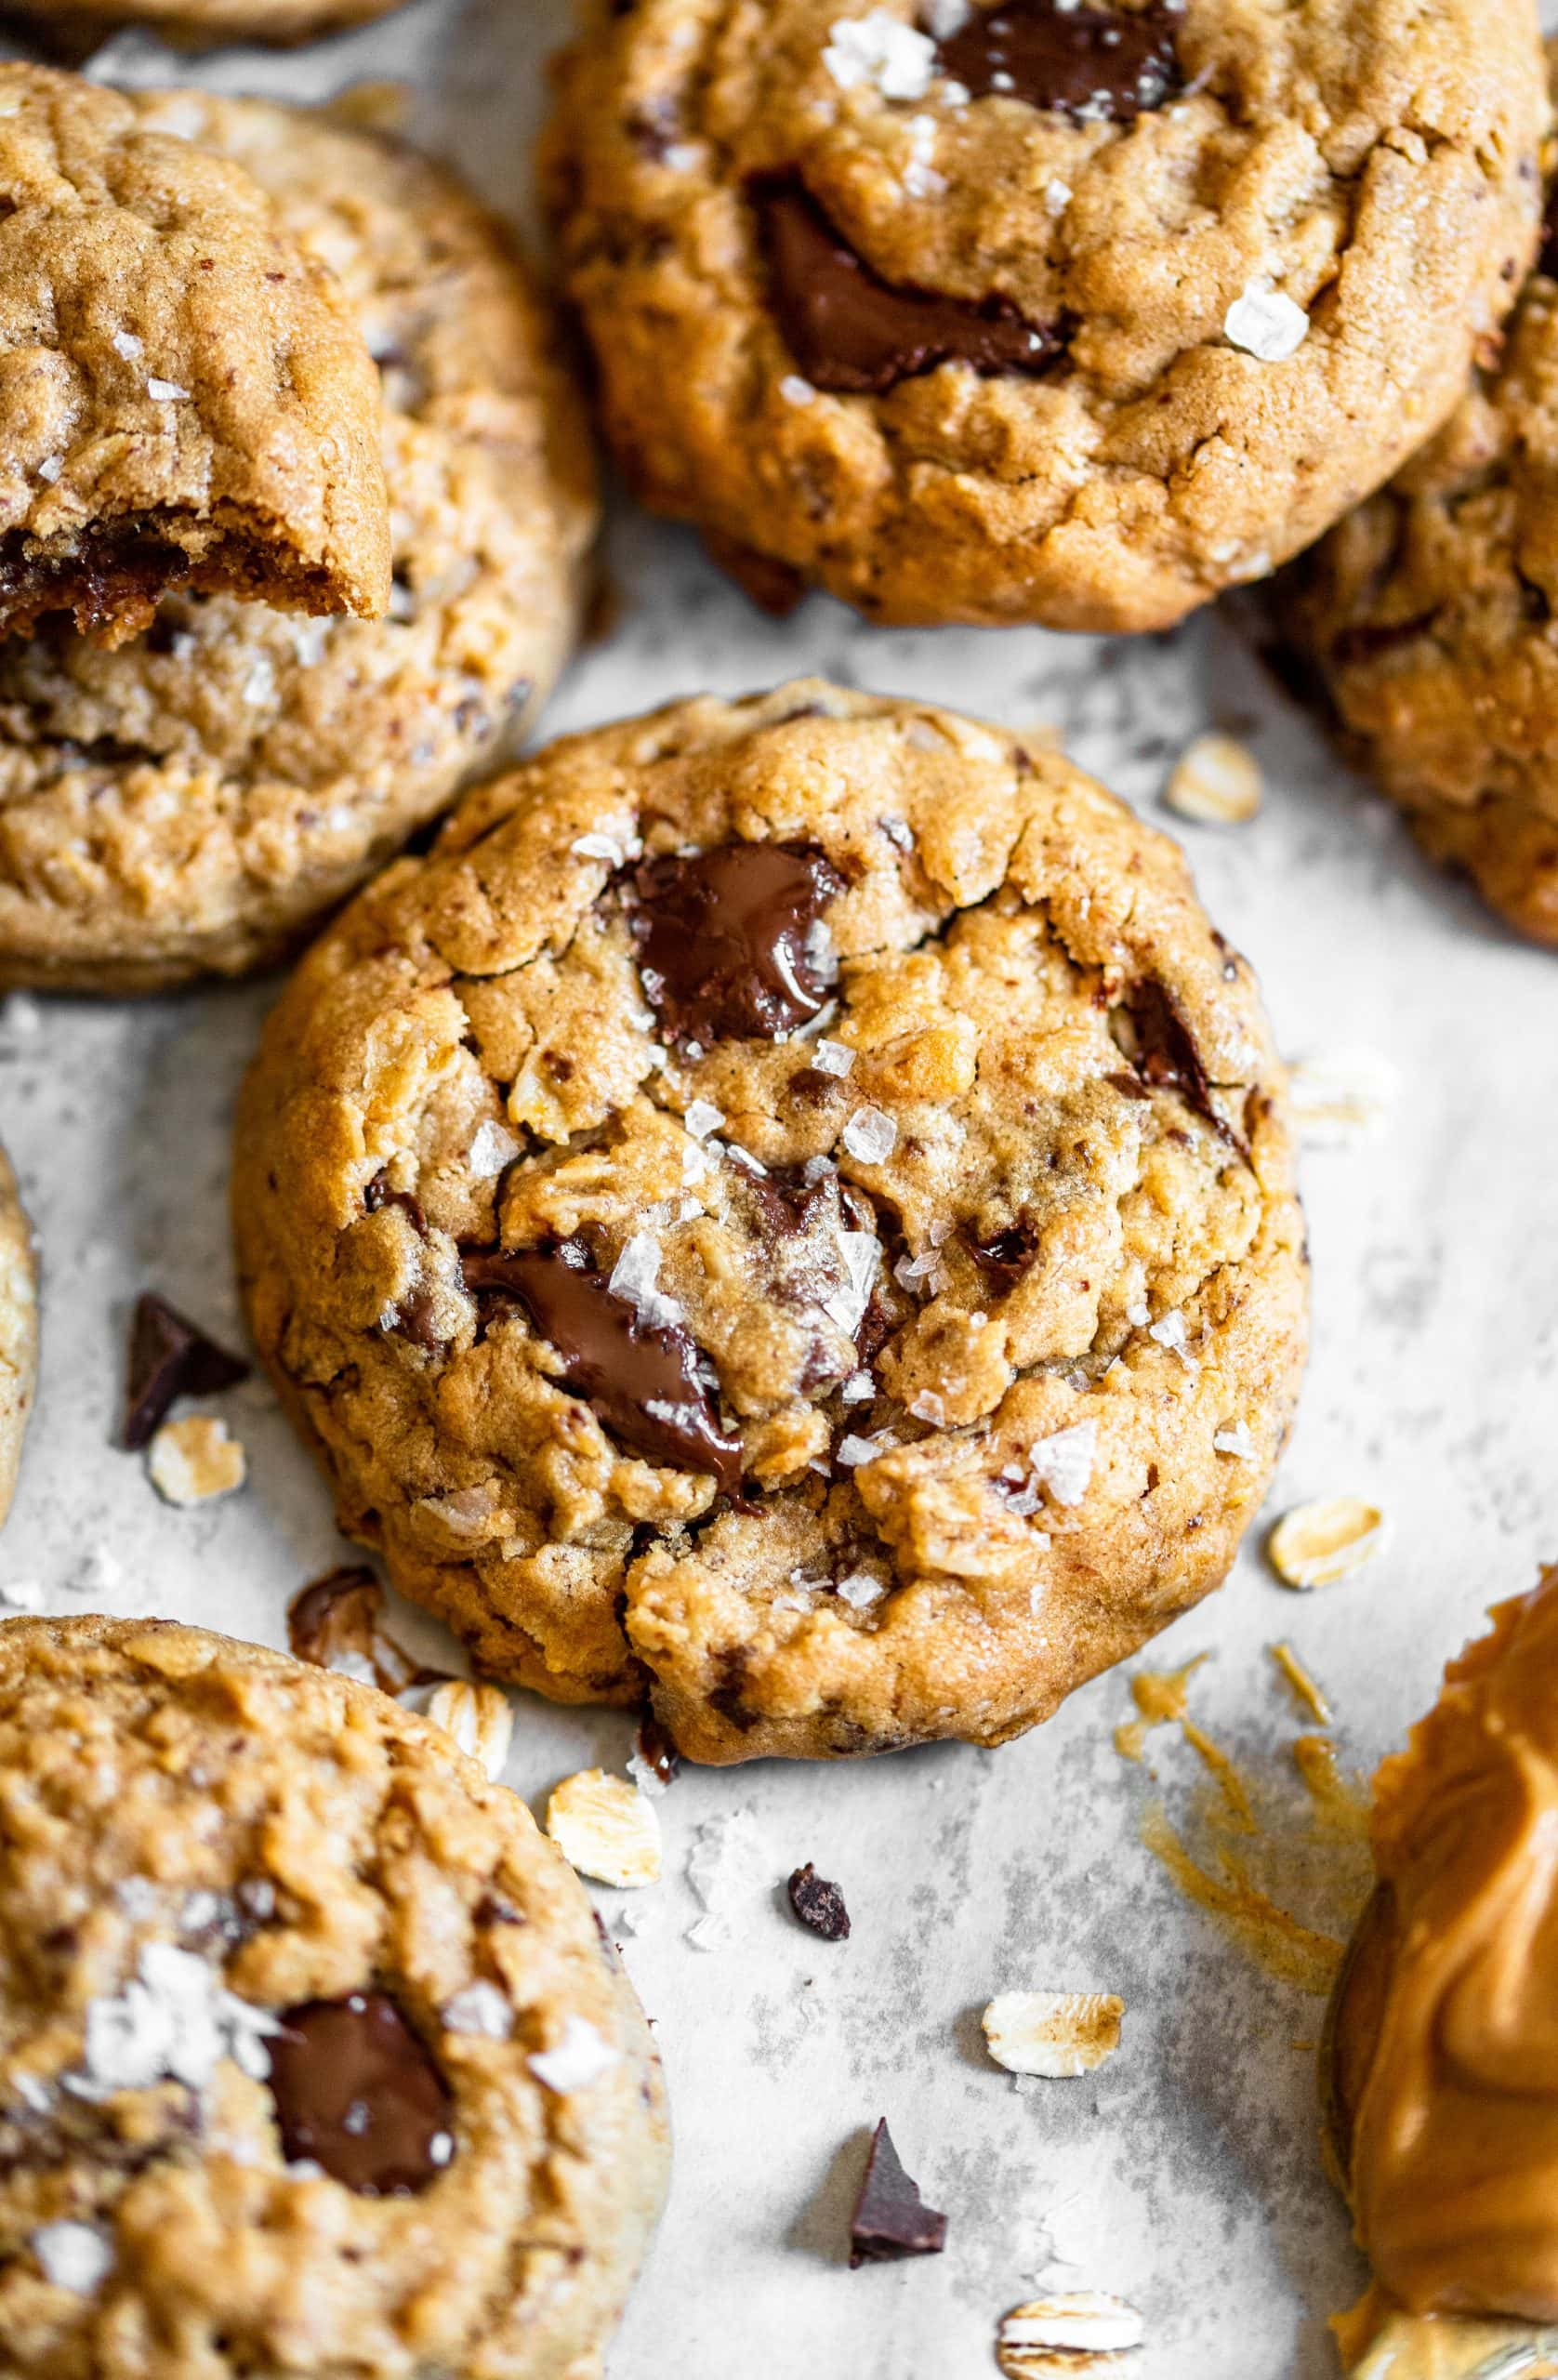 Peanut Butter Chocolate Chunk Oatmeal Cookies